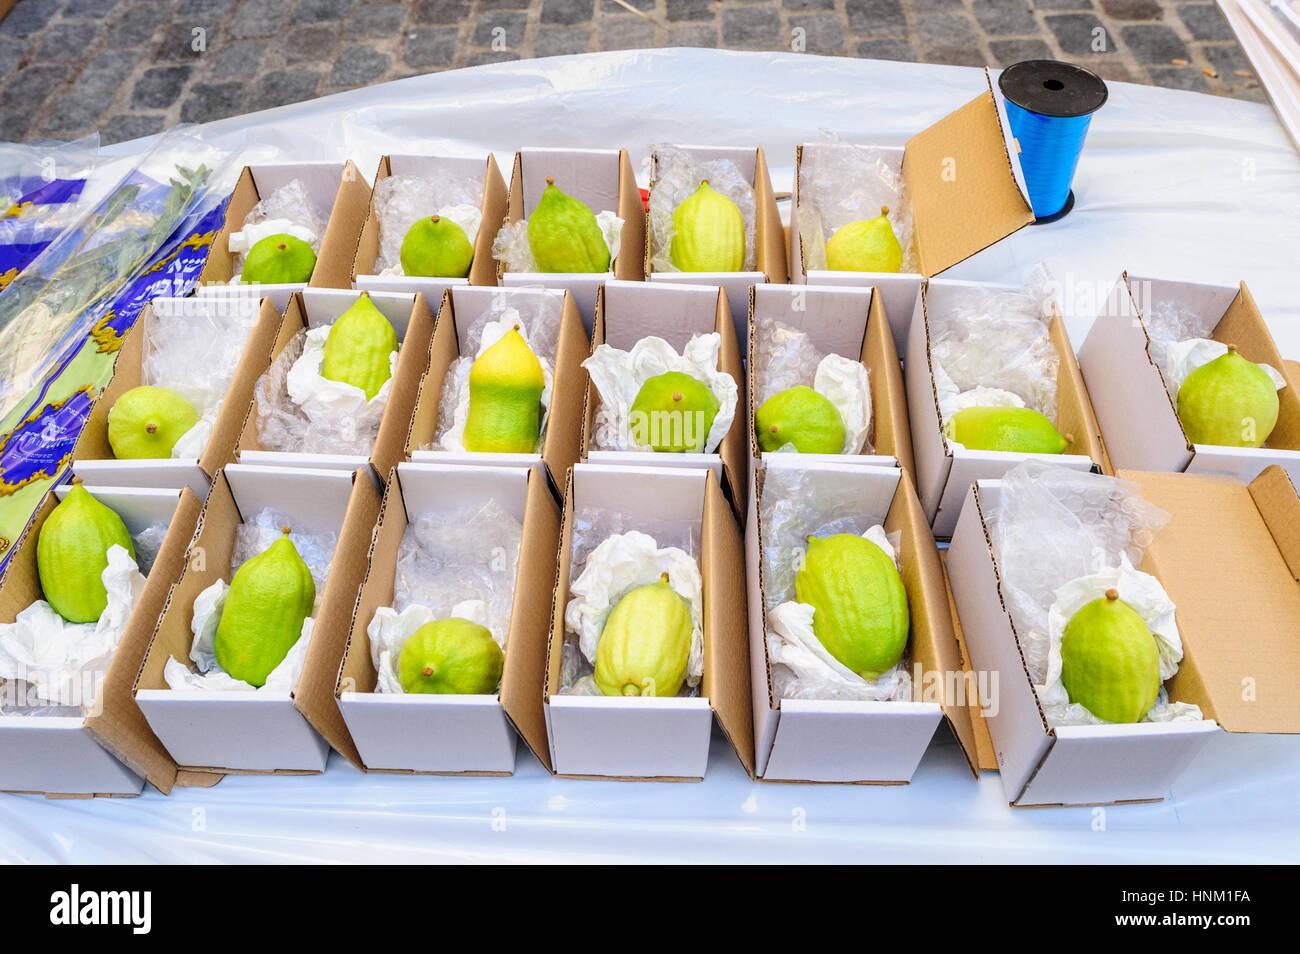 France, Paris, le Marais, etrog sold at sukkot - jewish holiday - Stock Image